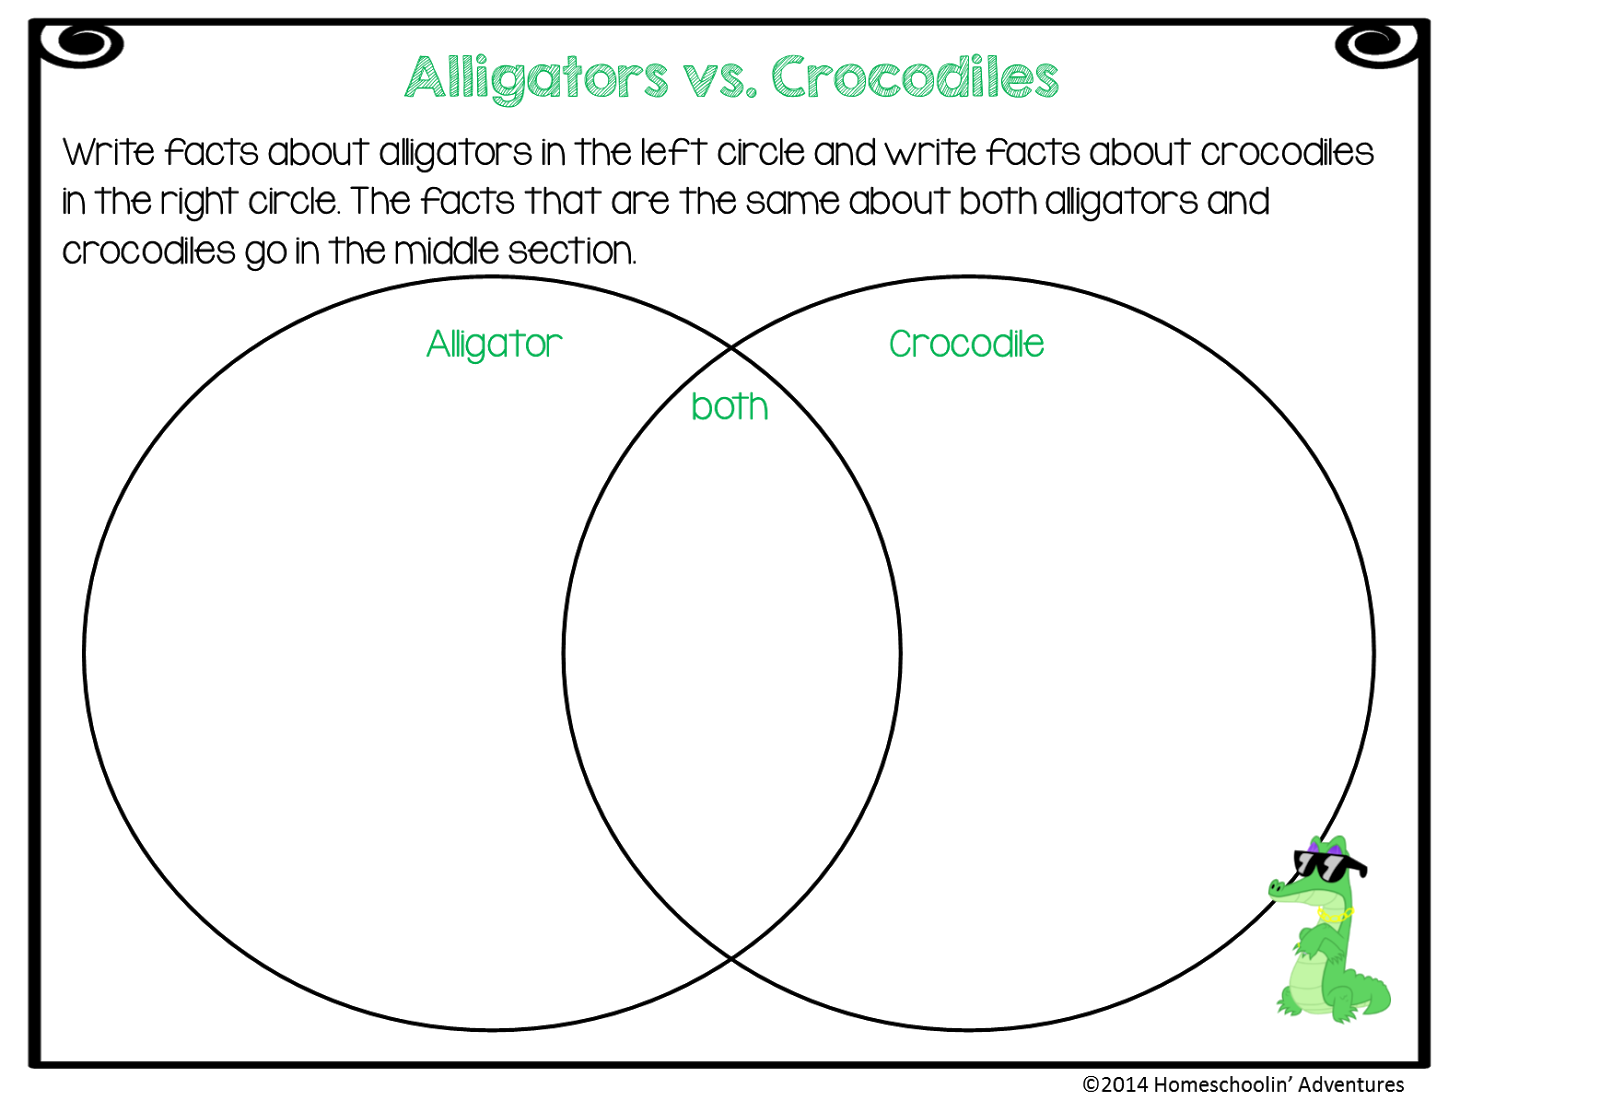 Alligator Food Chain Diagram How To Make Sun Path Crocodile Related Keywords